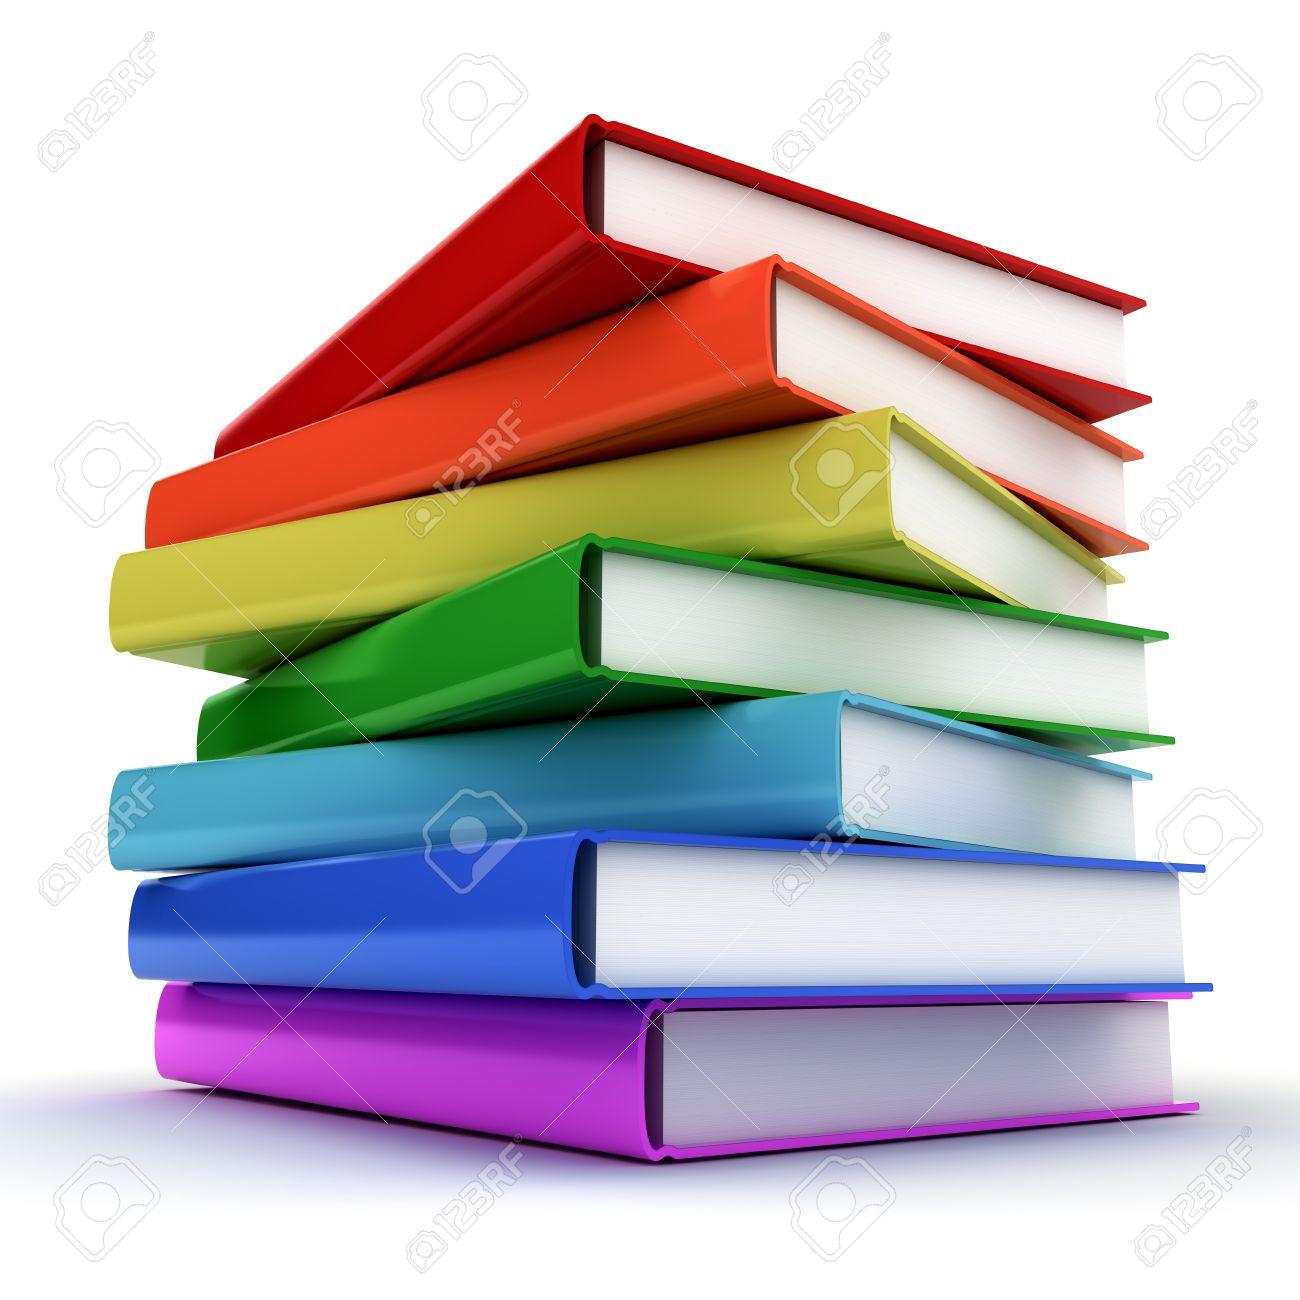 Hermosa Libros Coloridos Friso - Dibujos Para Colorear En Línea ...